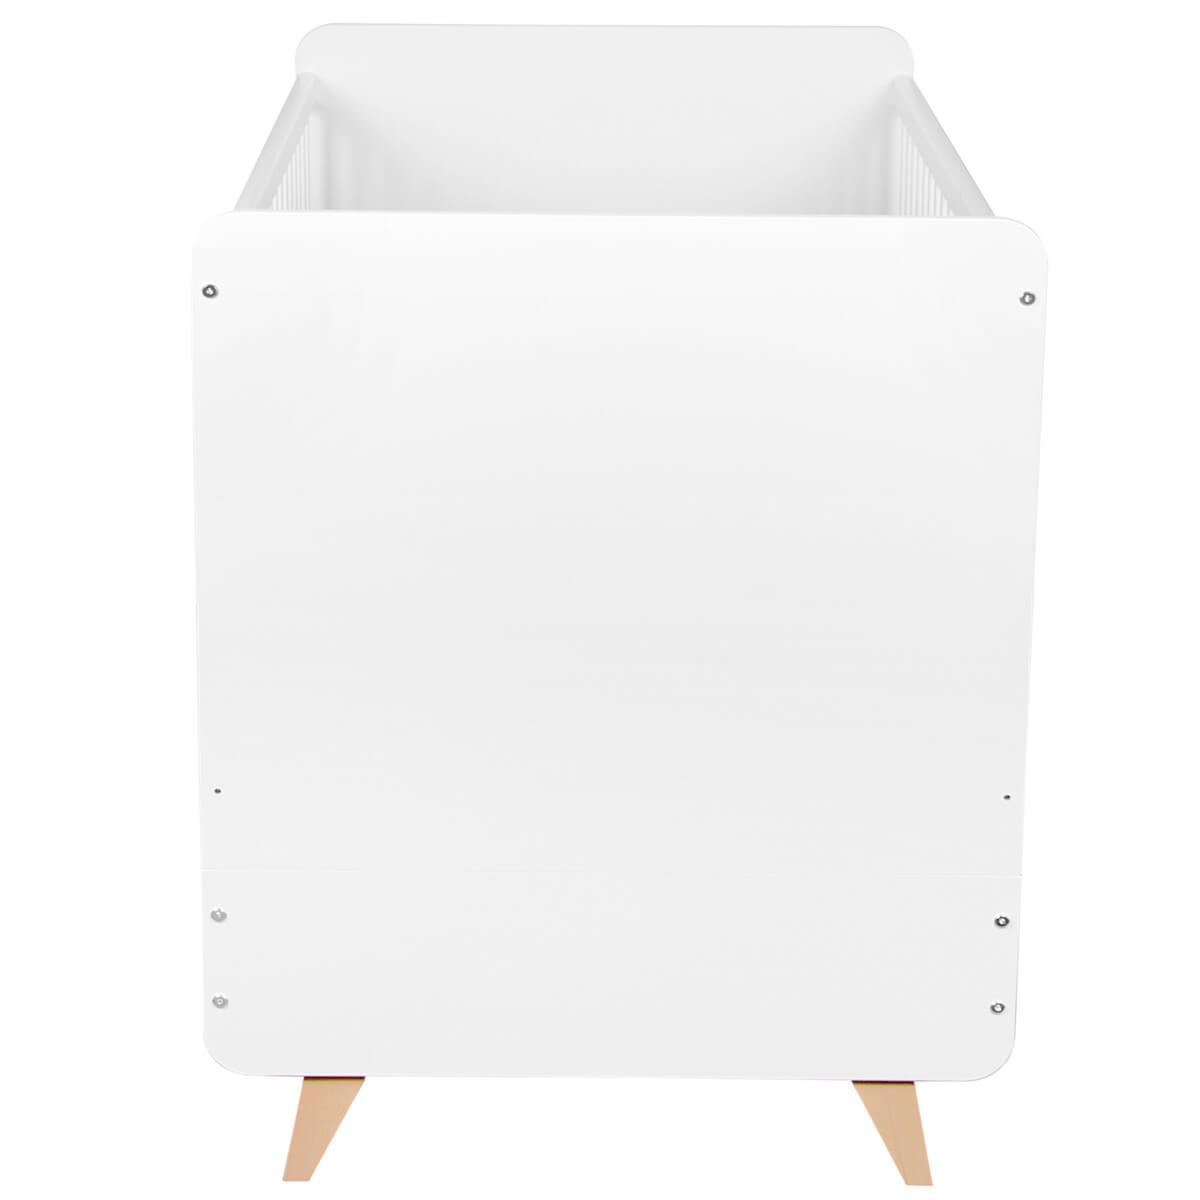 Lit évolutif 70x140cm LOFT Quax blanc